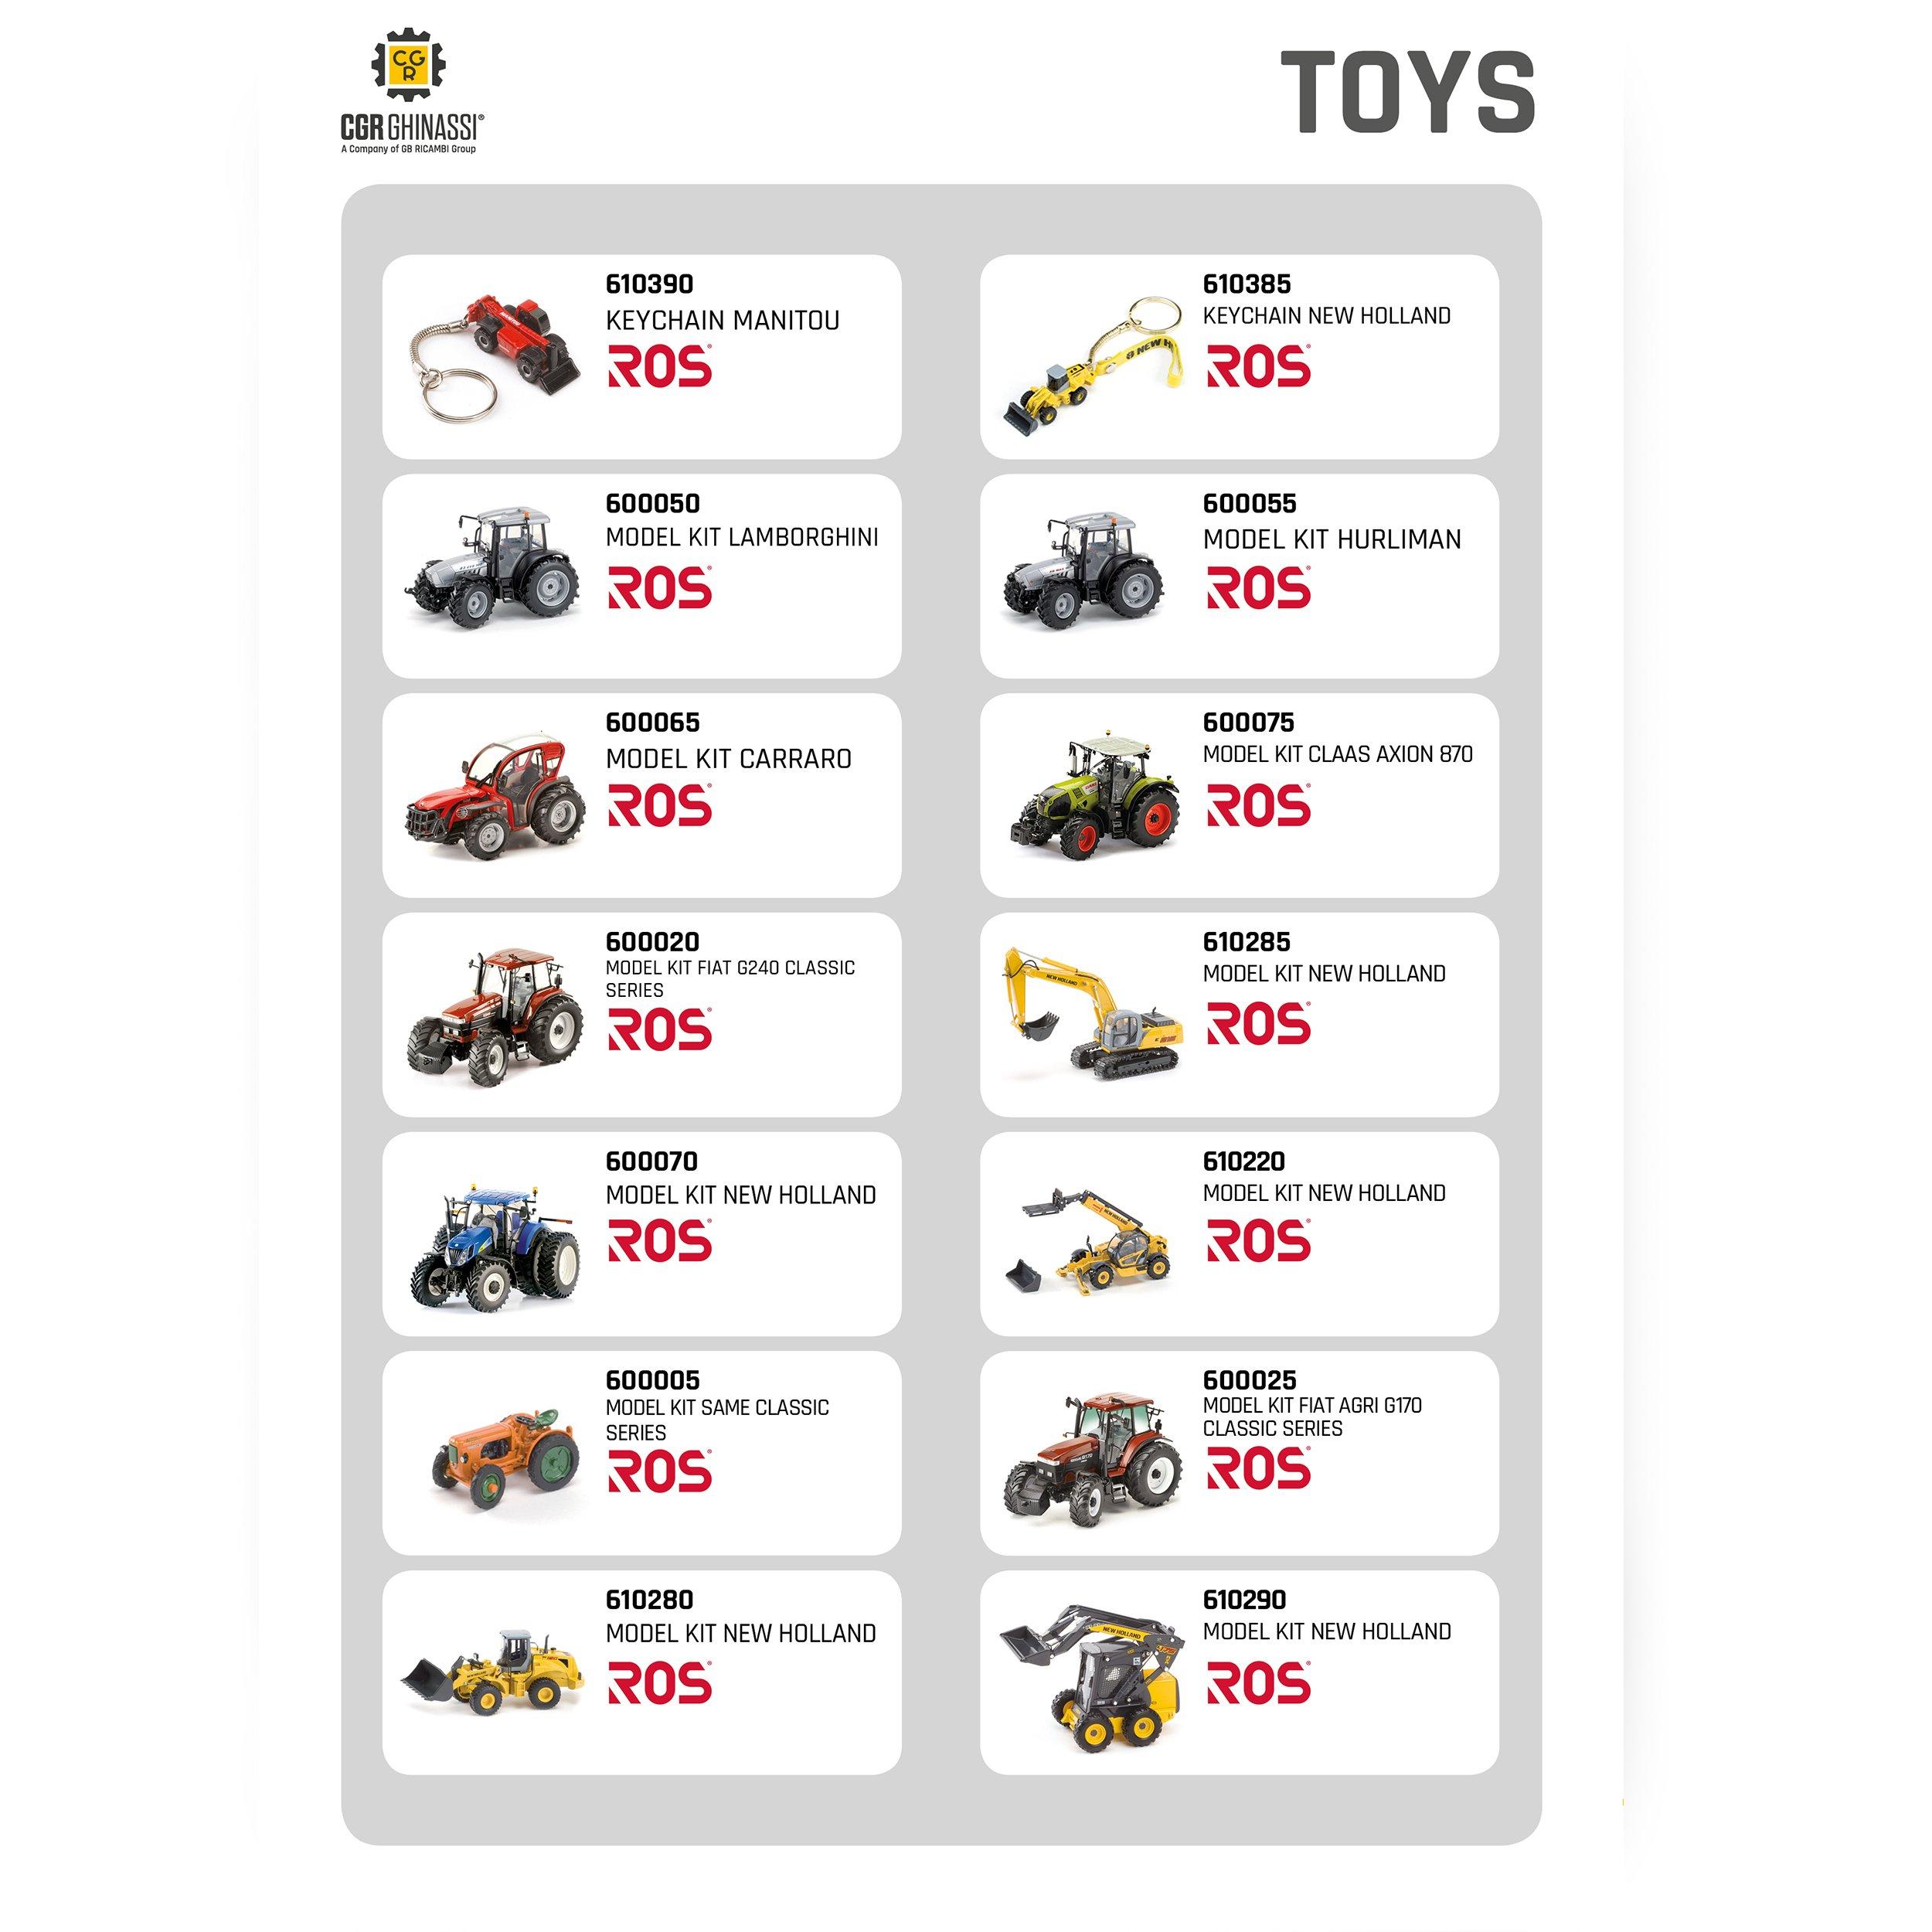 mockup toys